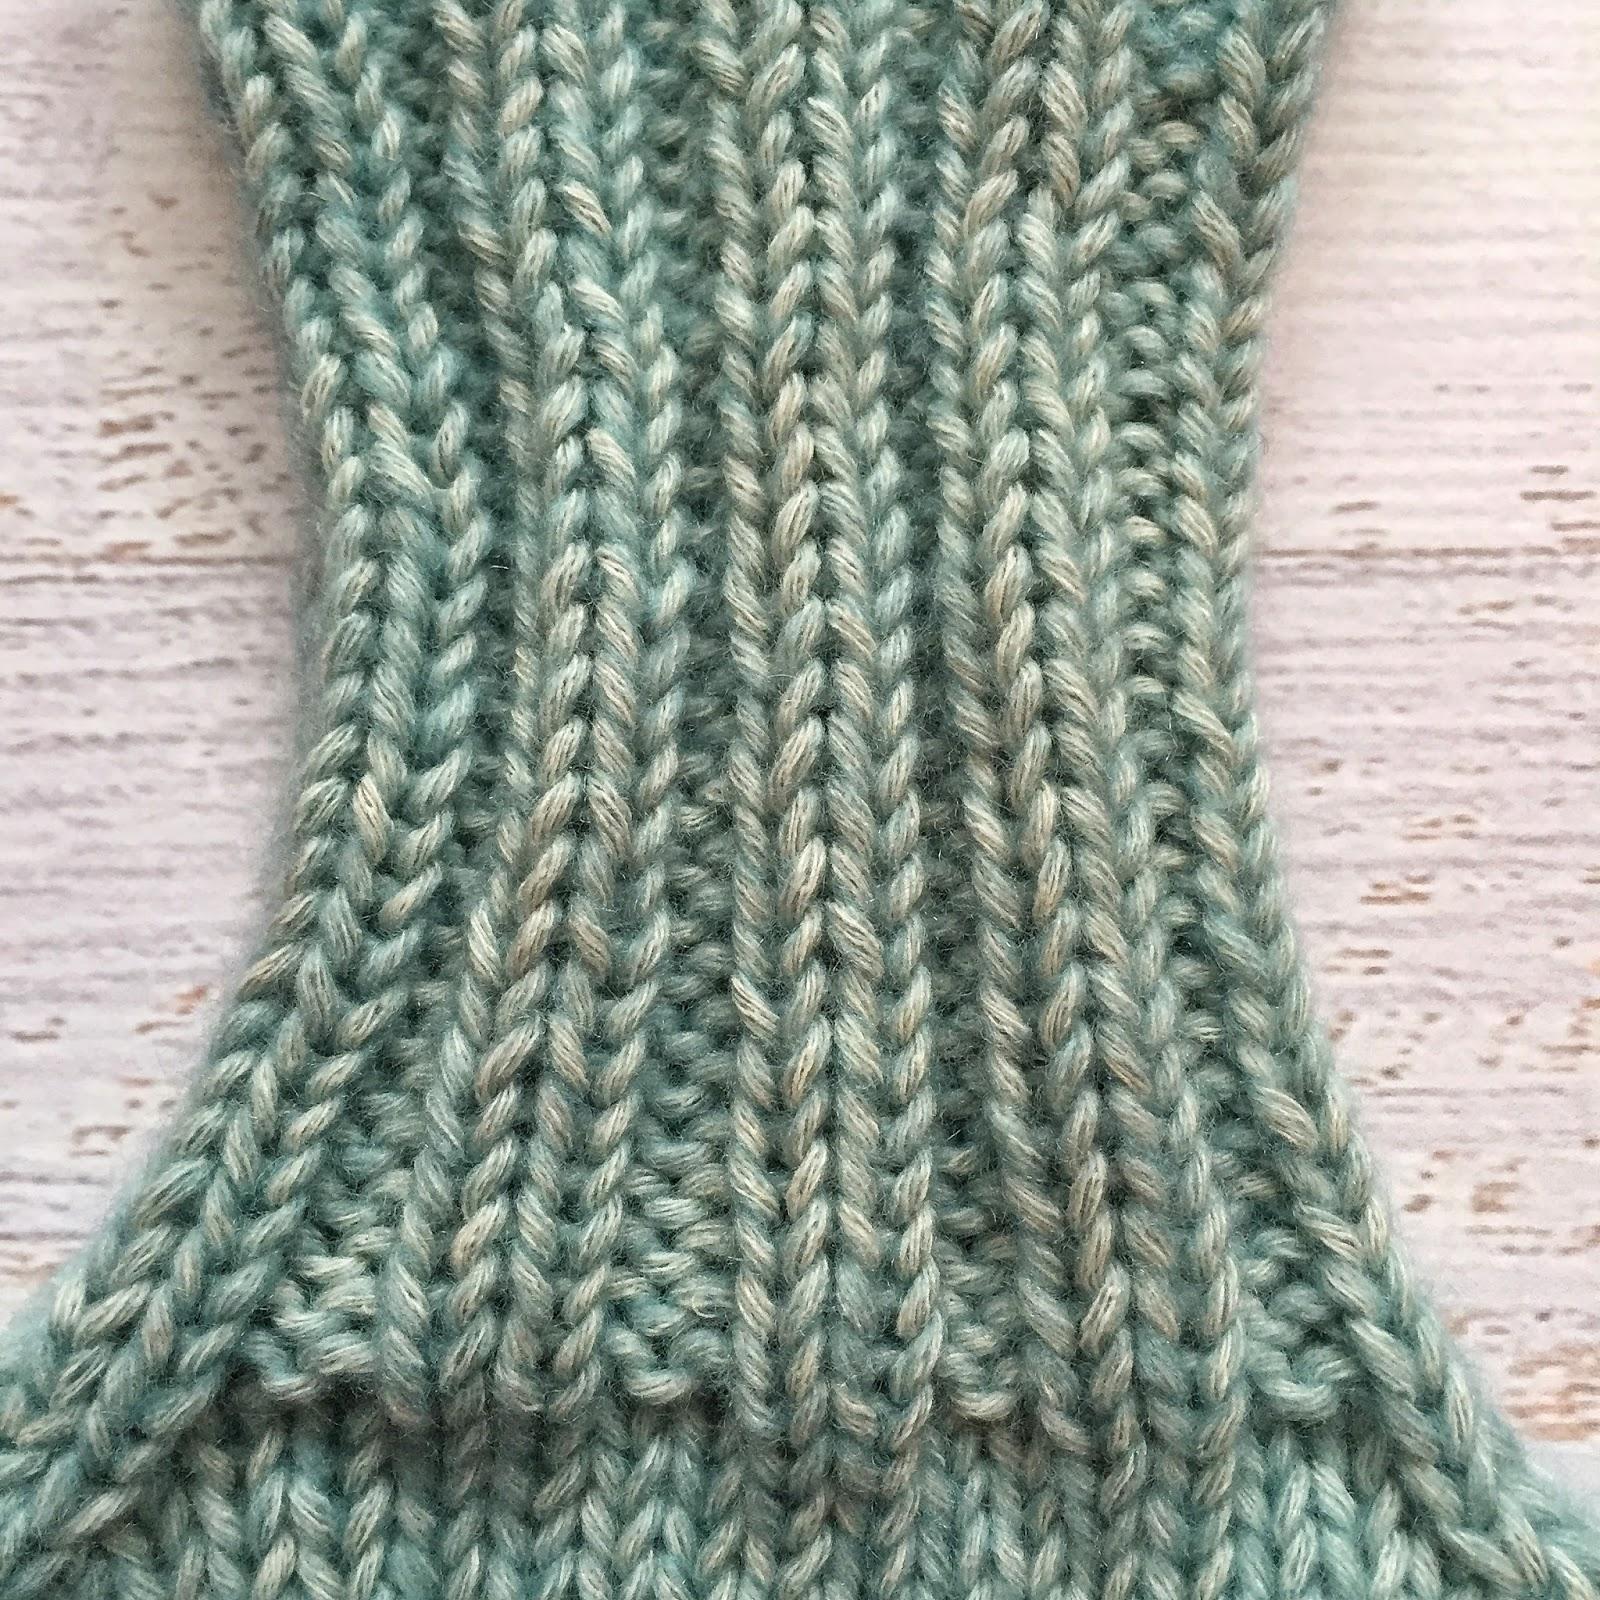 Knitting Rib Stitch On Circular Needles : Fifty shades of ply scheepjes christmas hop free